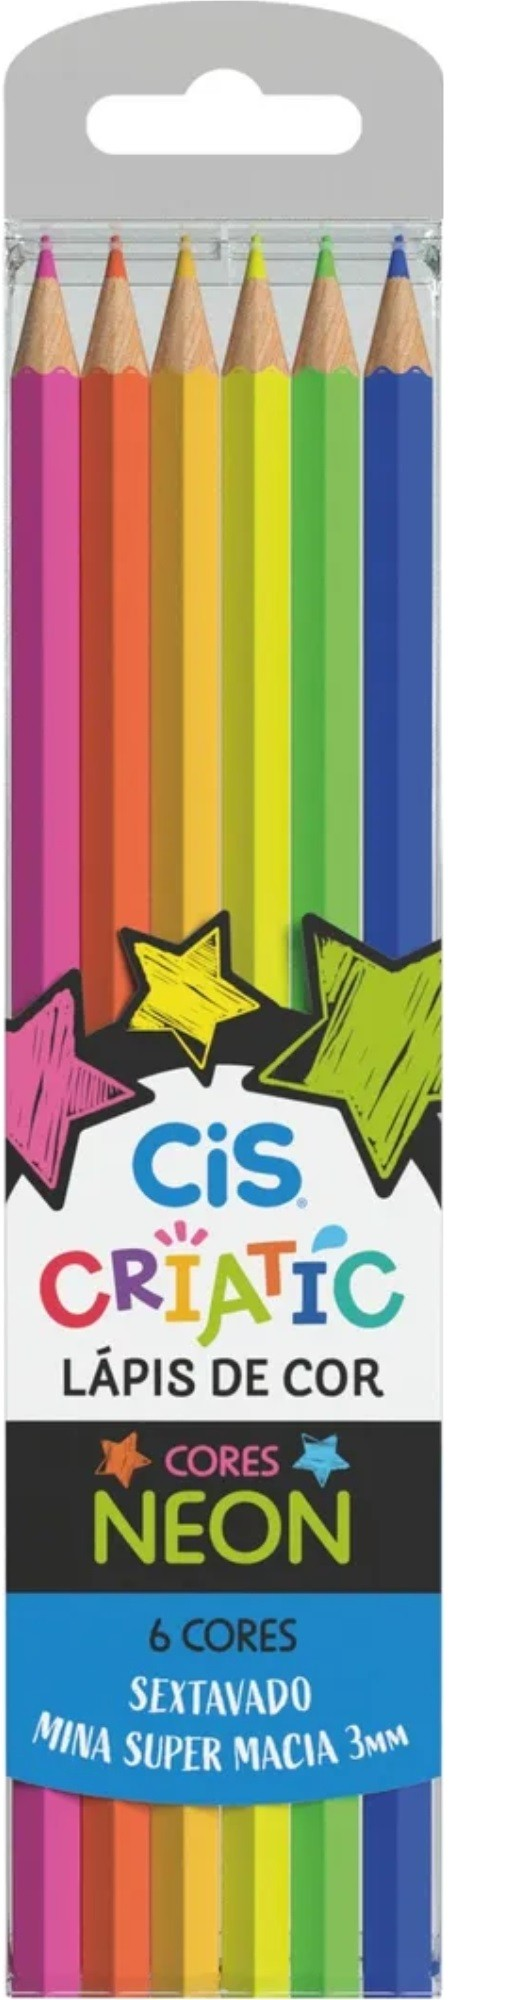 Lápis De Cor Neon Criatic Cis 6 Cores